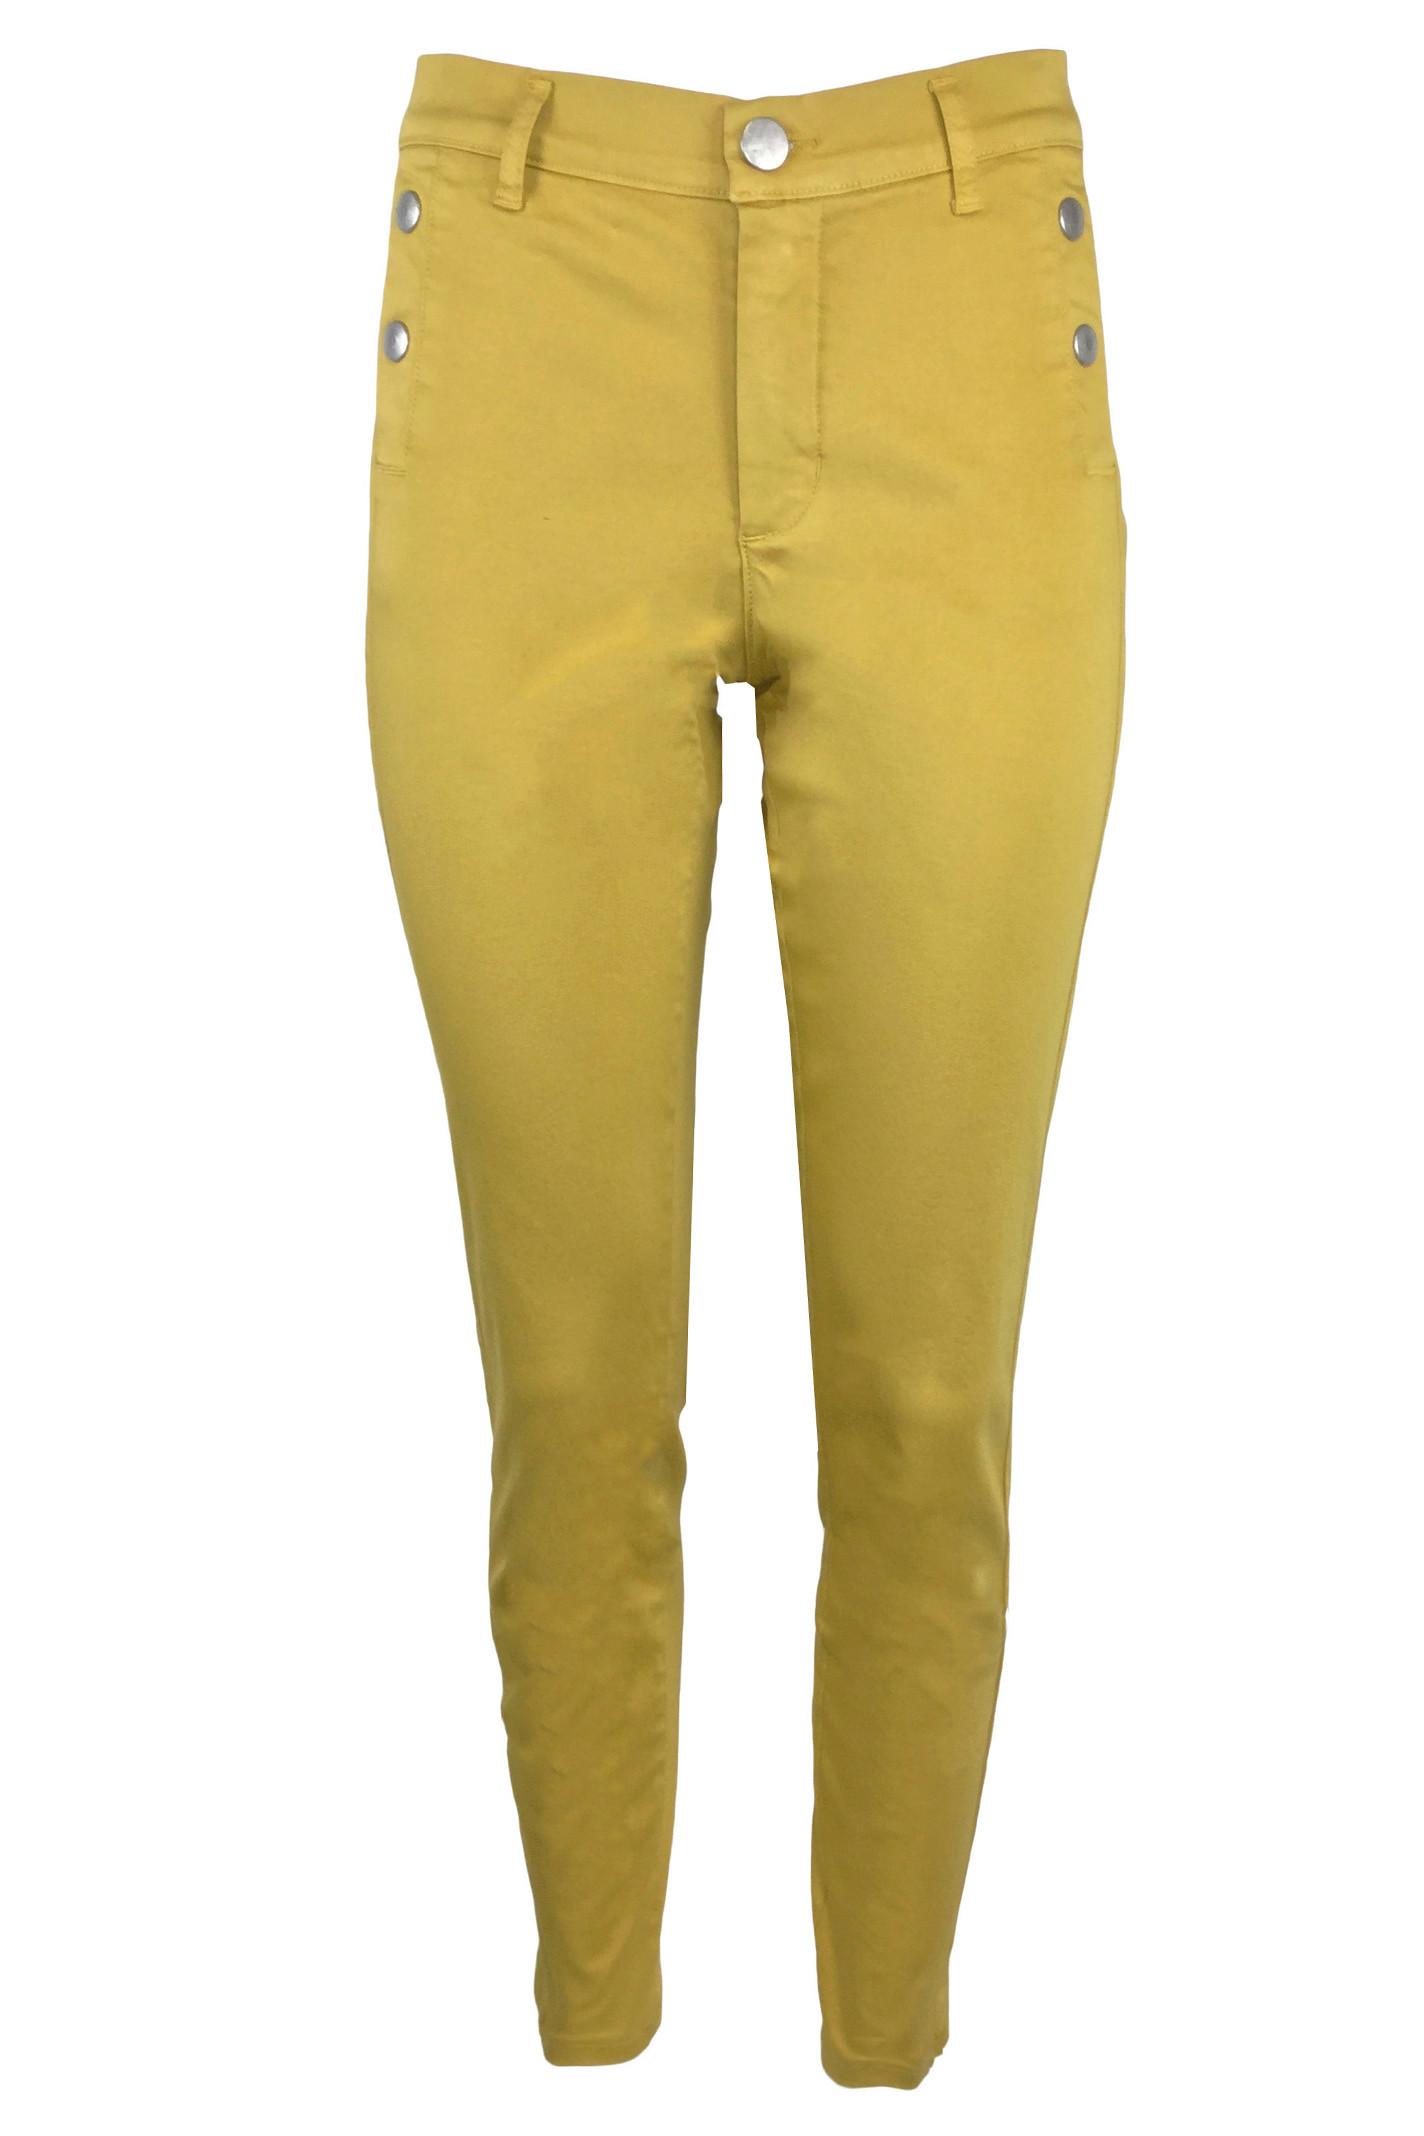 2-BIZ KAXY Yellow